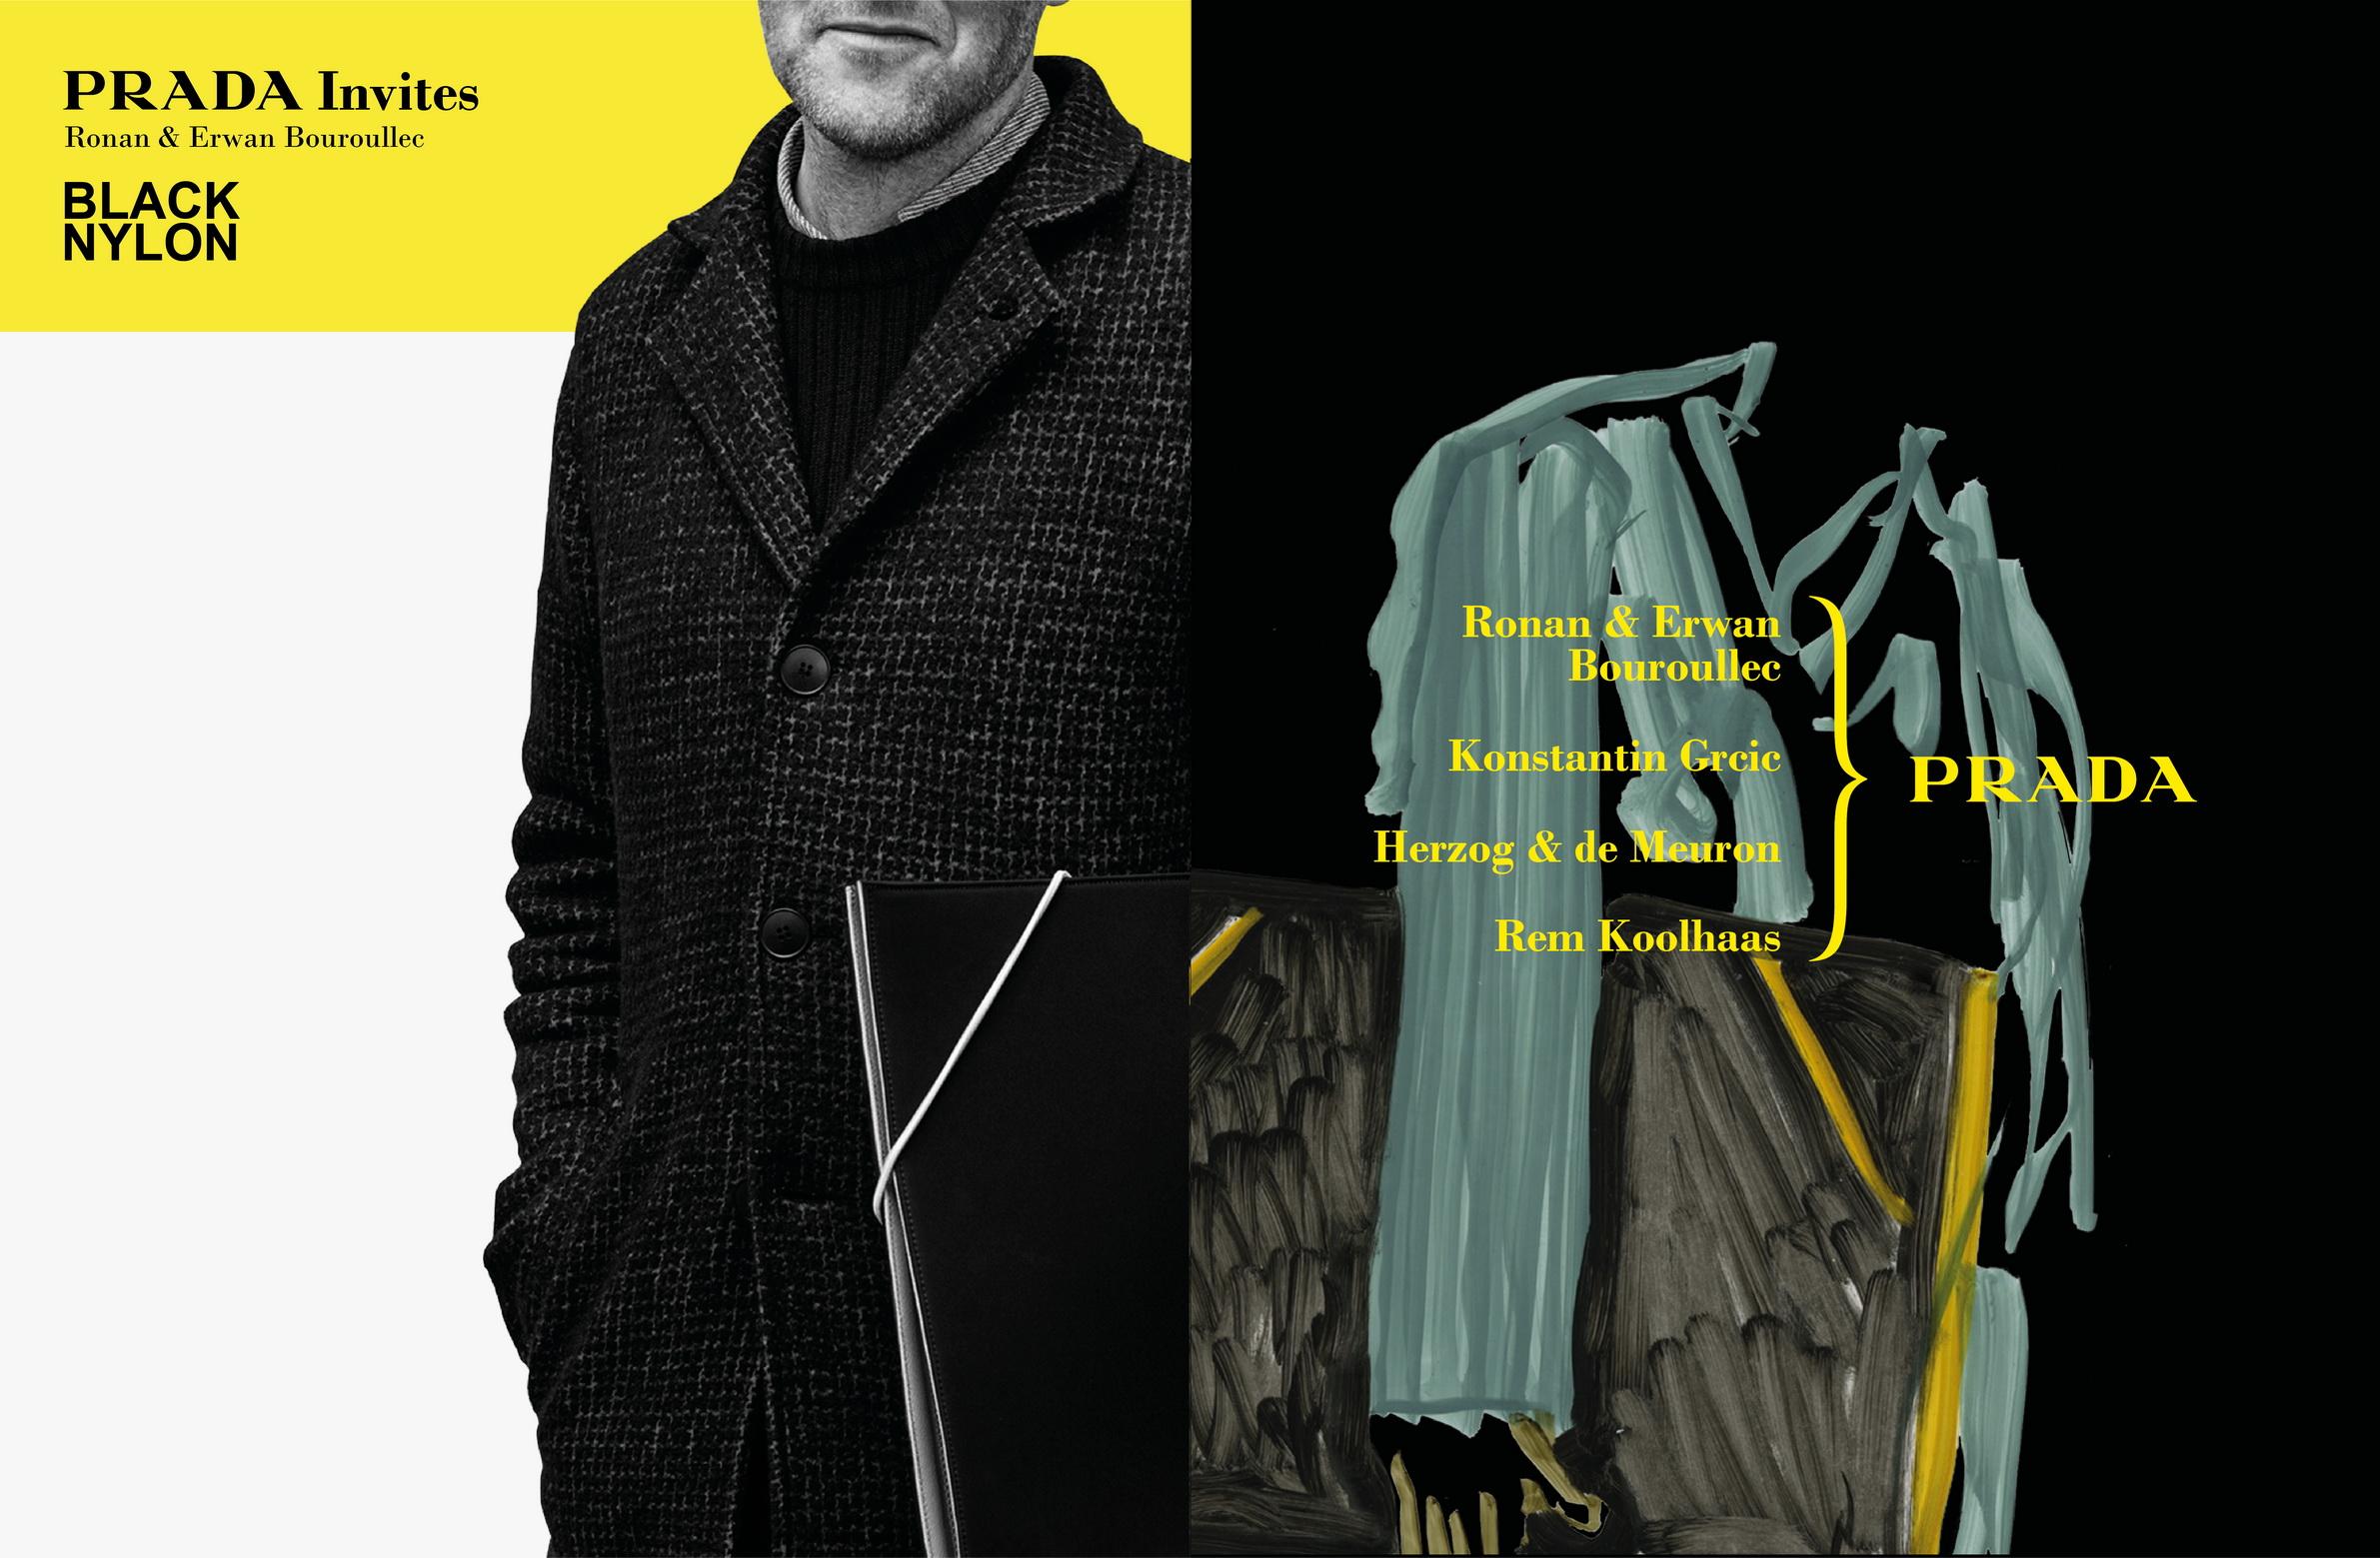 Prada Invites Advertising Campaign_Ronan & Erwan Bouroullec